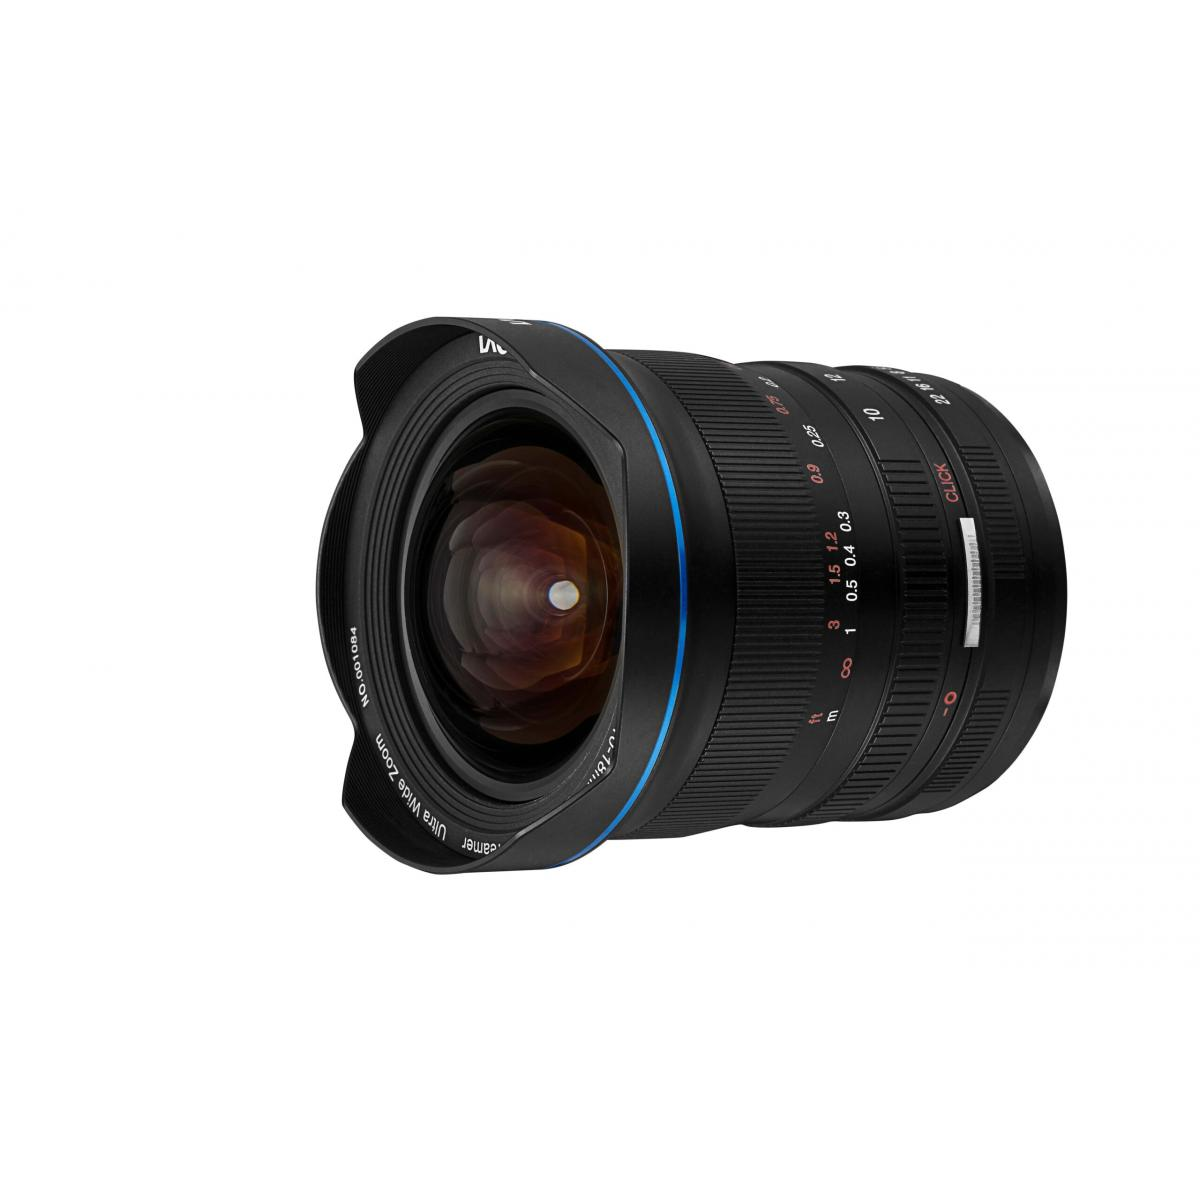 Laowa C-Dreamer 10-18 mm f/4,5-5,6 for Nikon Z